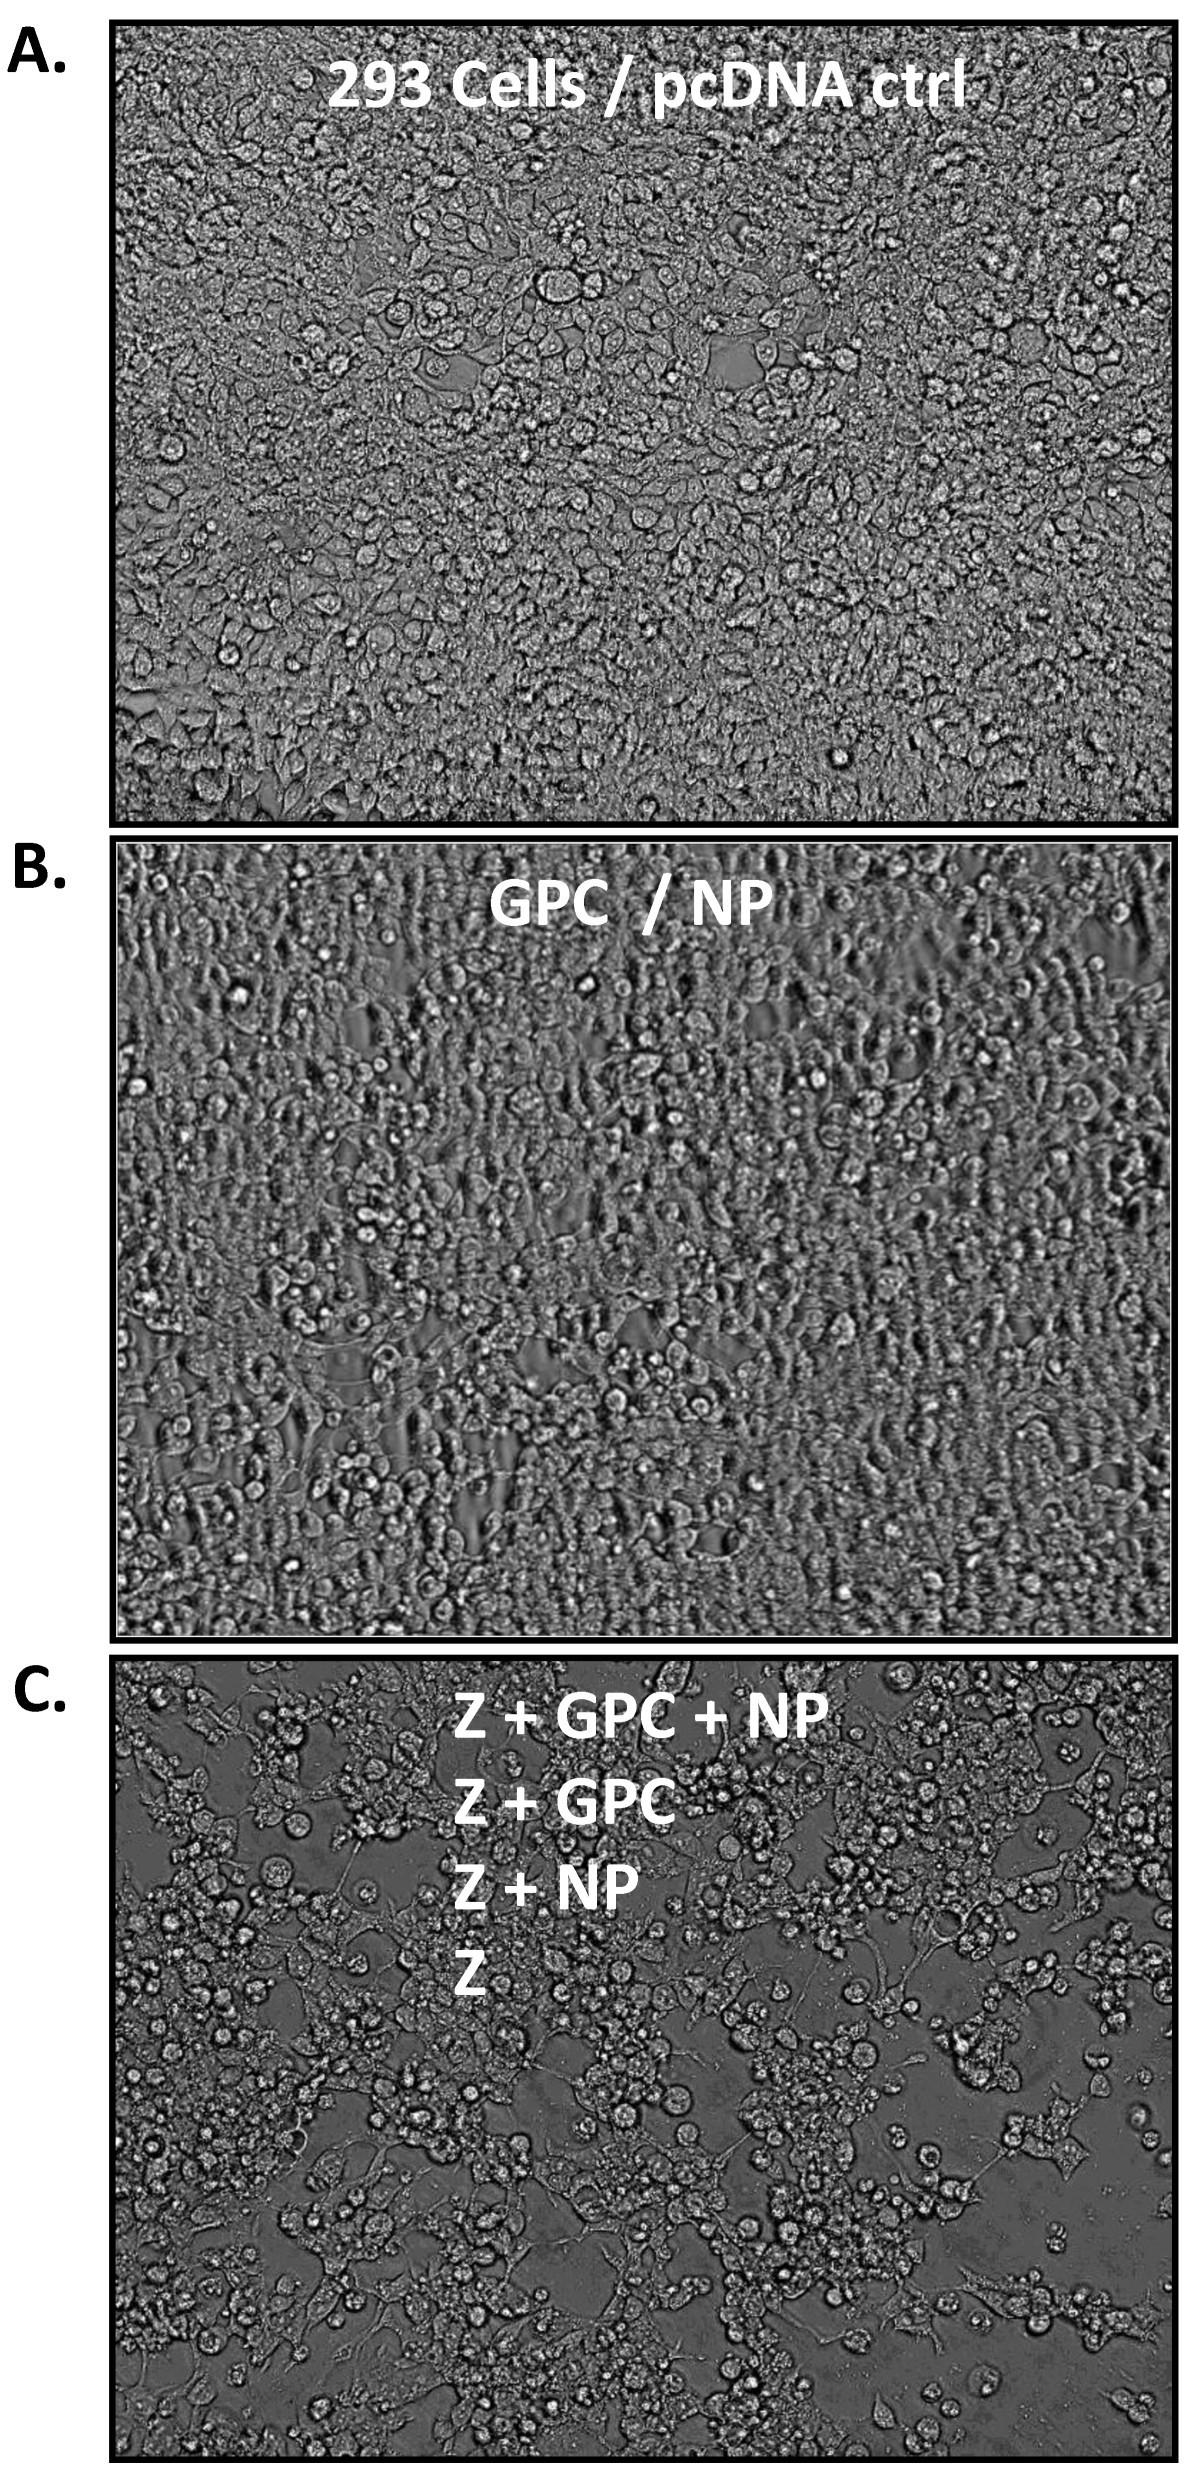 Lassa Virus Like Particles Displaying All Major Immunological